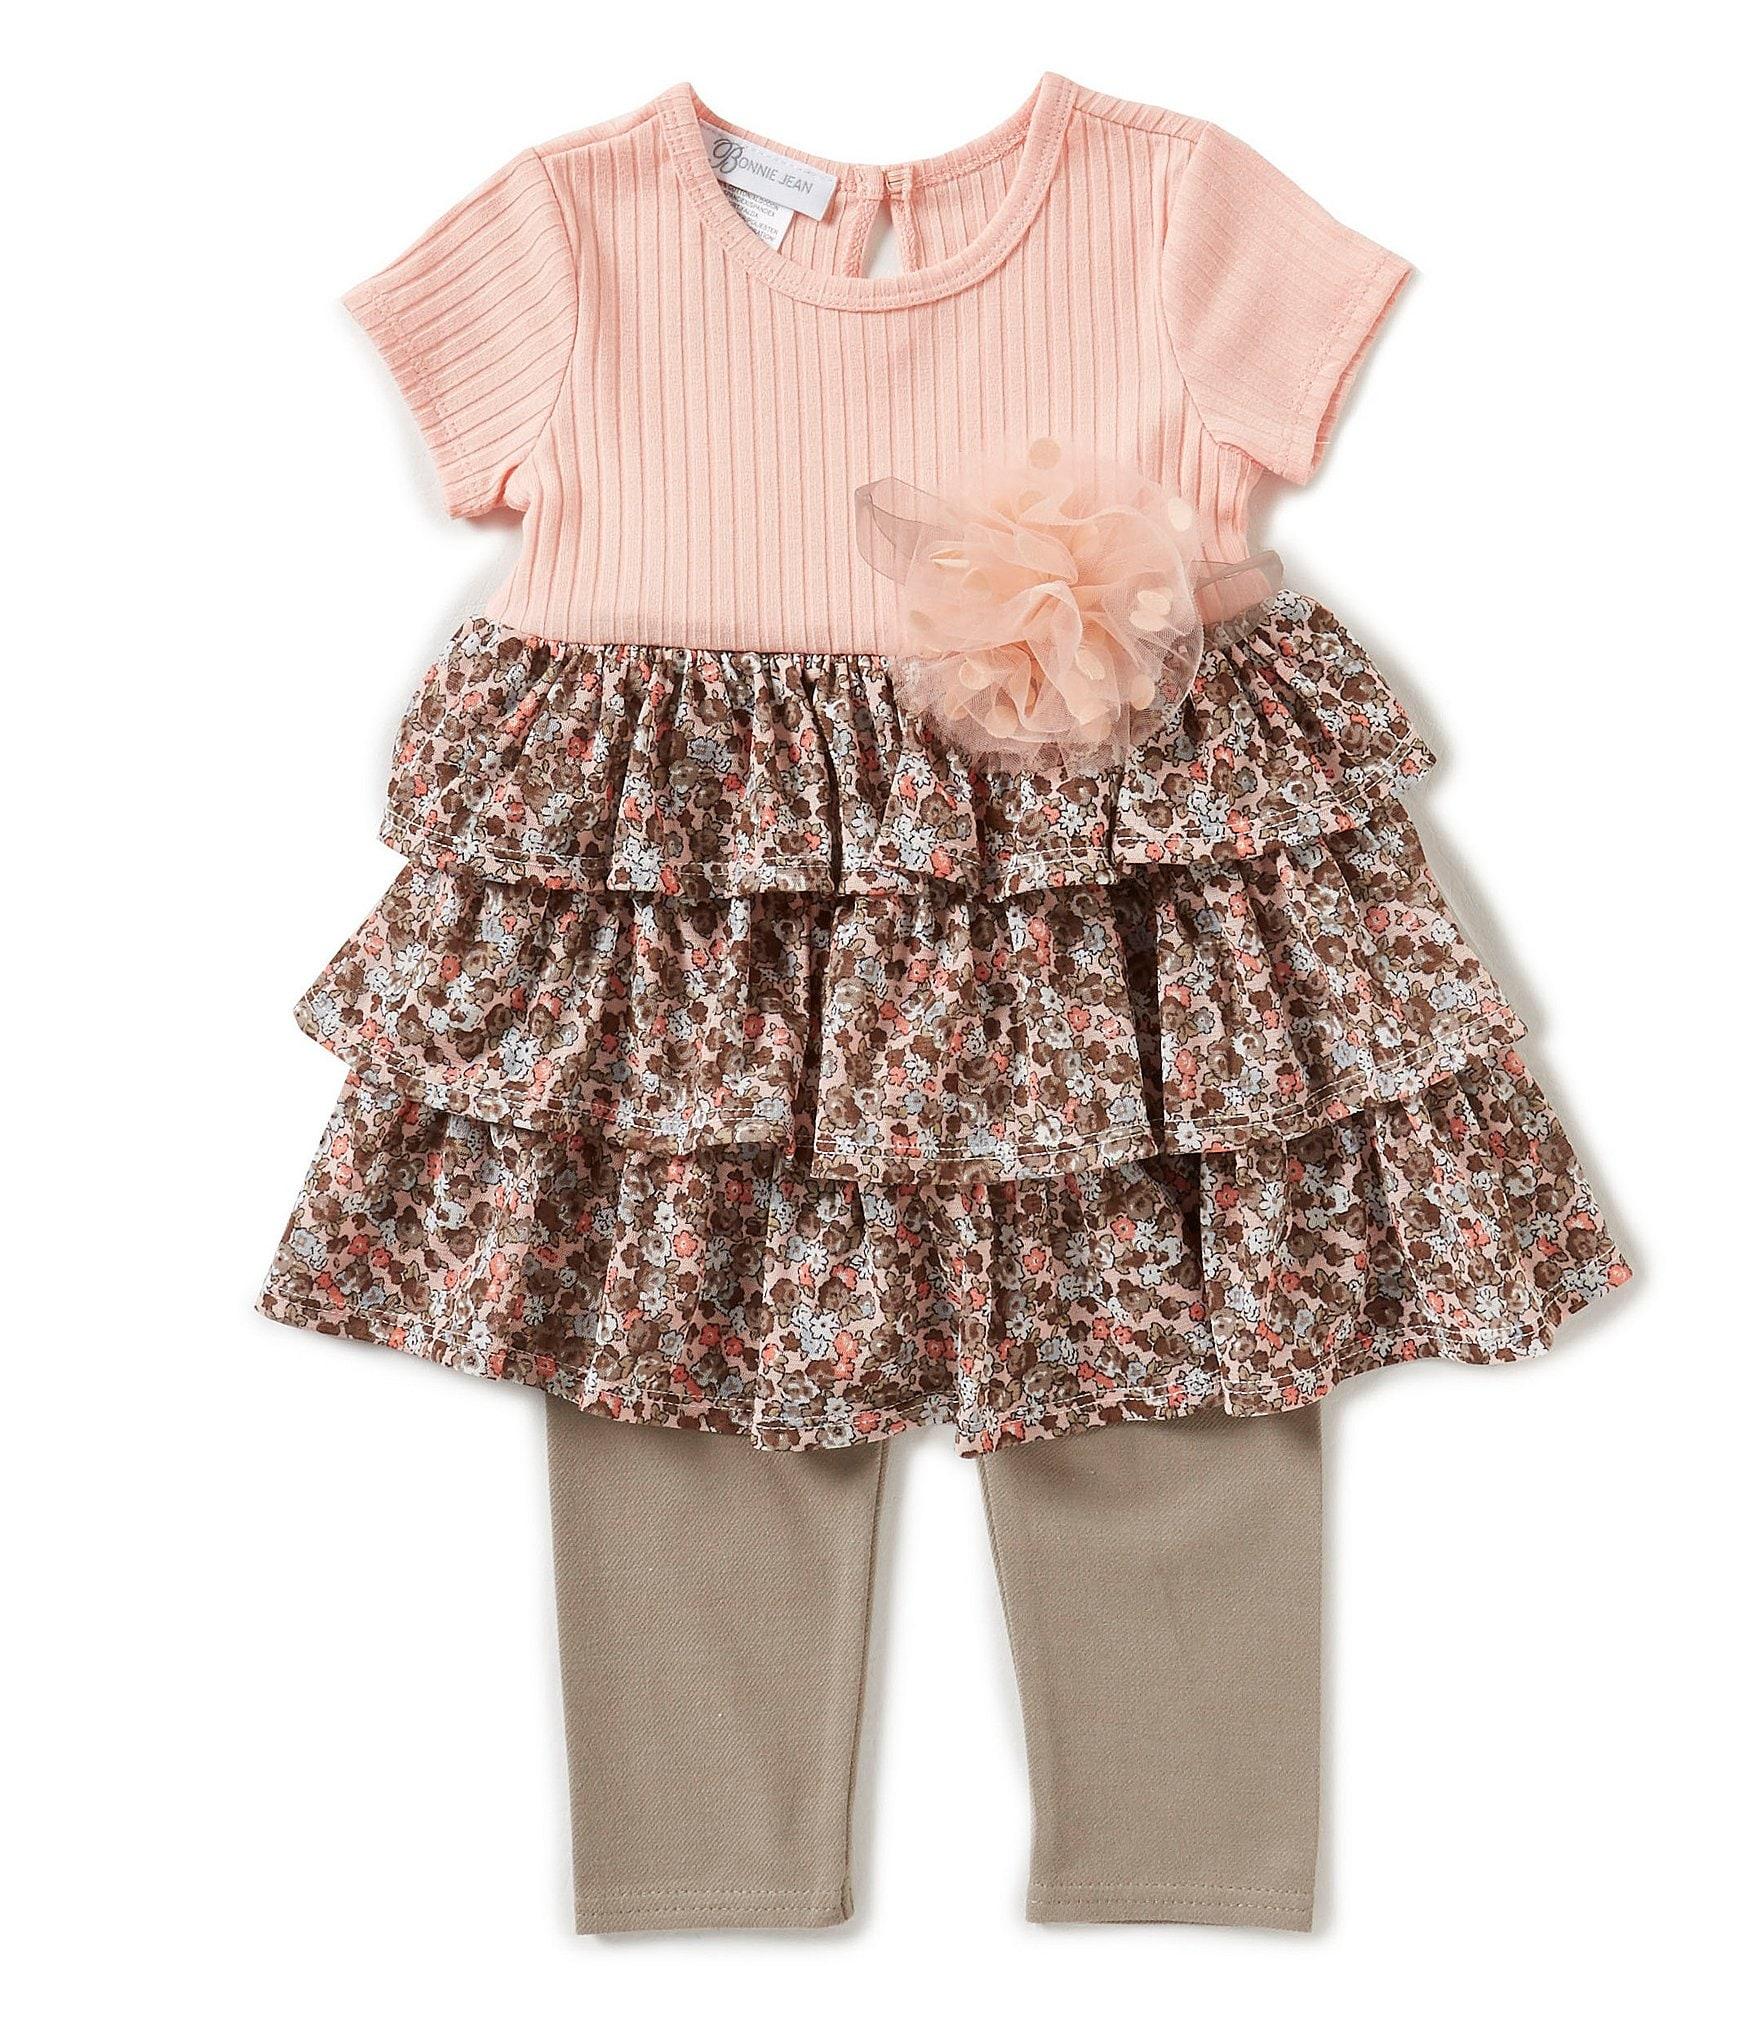 kids girls outfits sets dillards